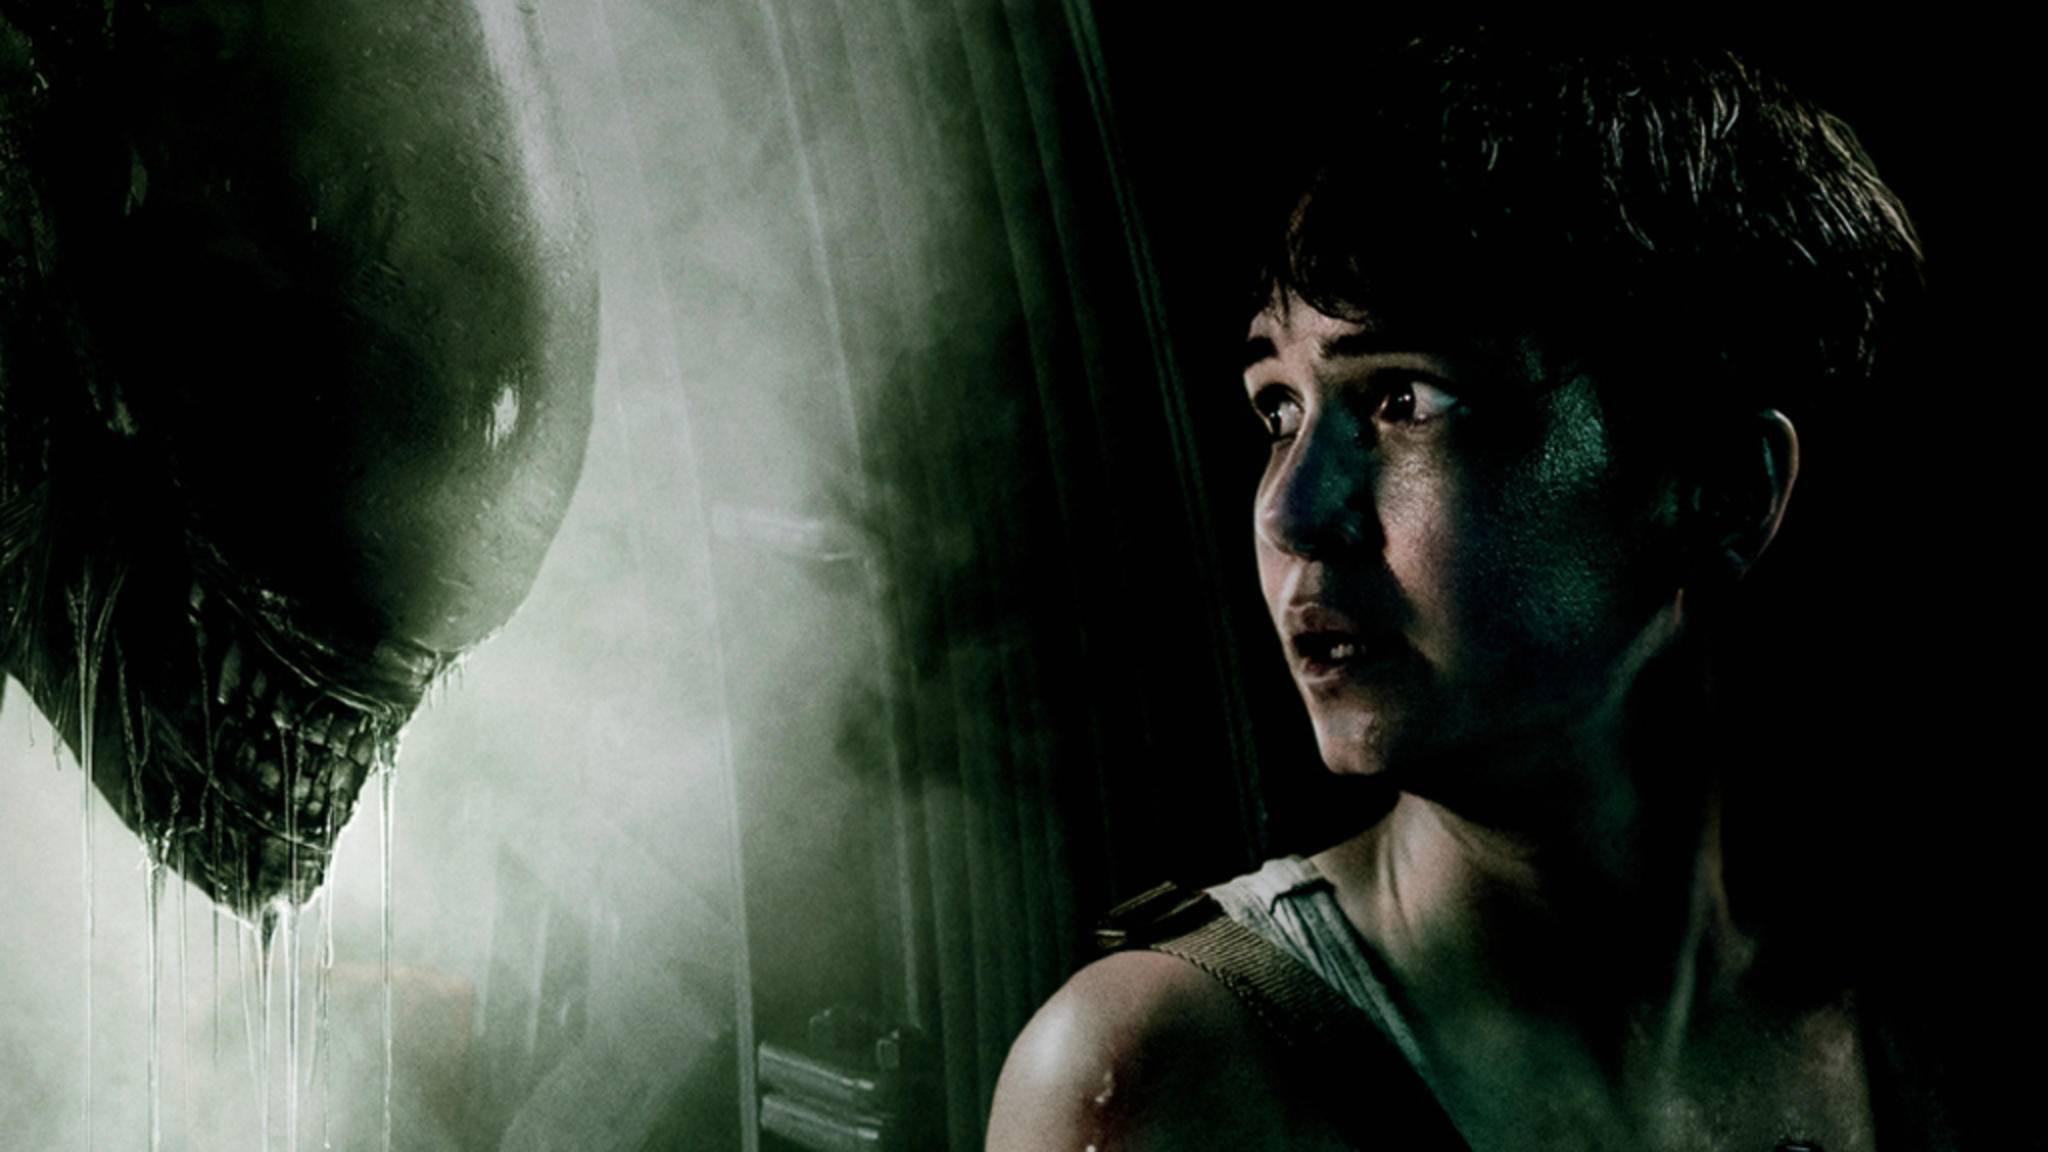 Hat der fiese Alien schon bald ausgegeifert?